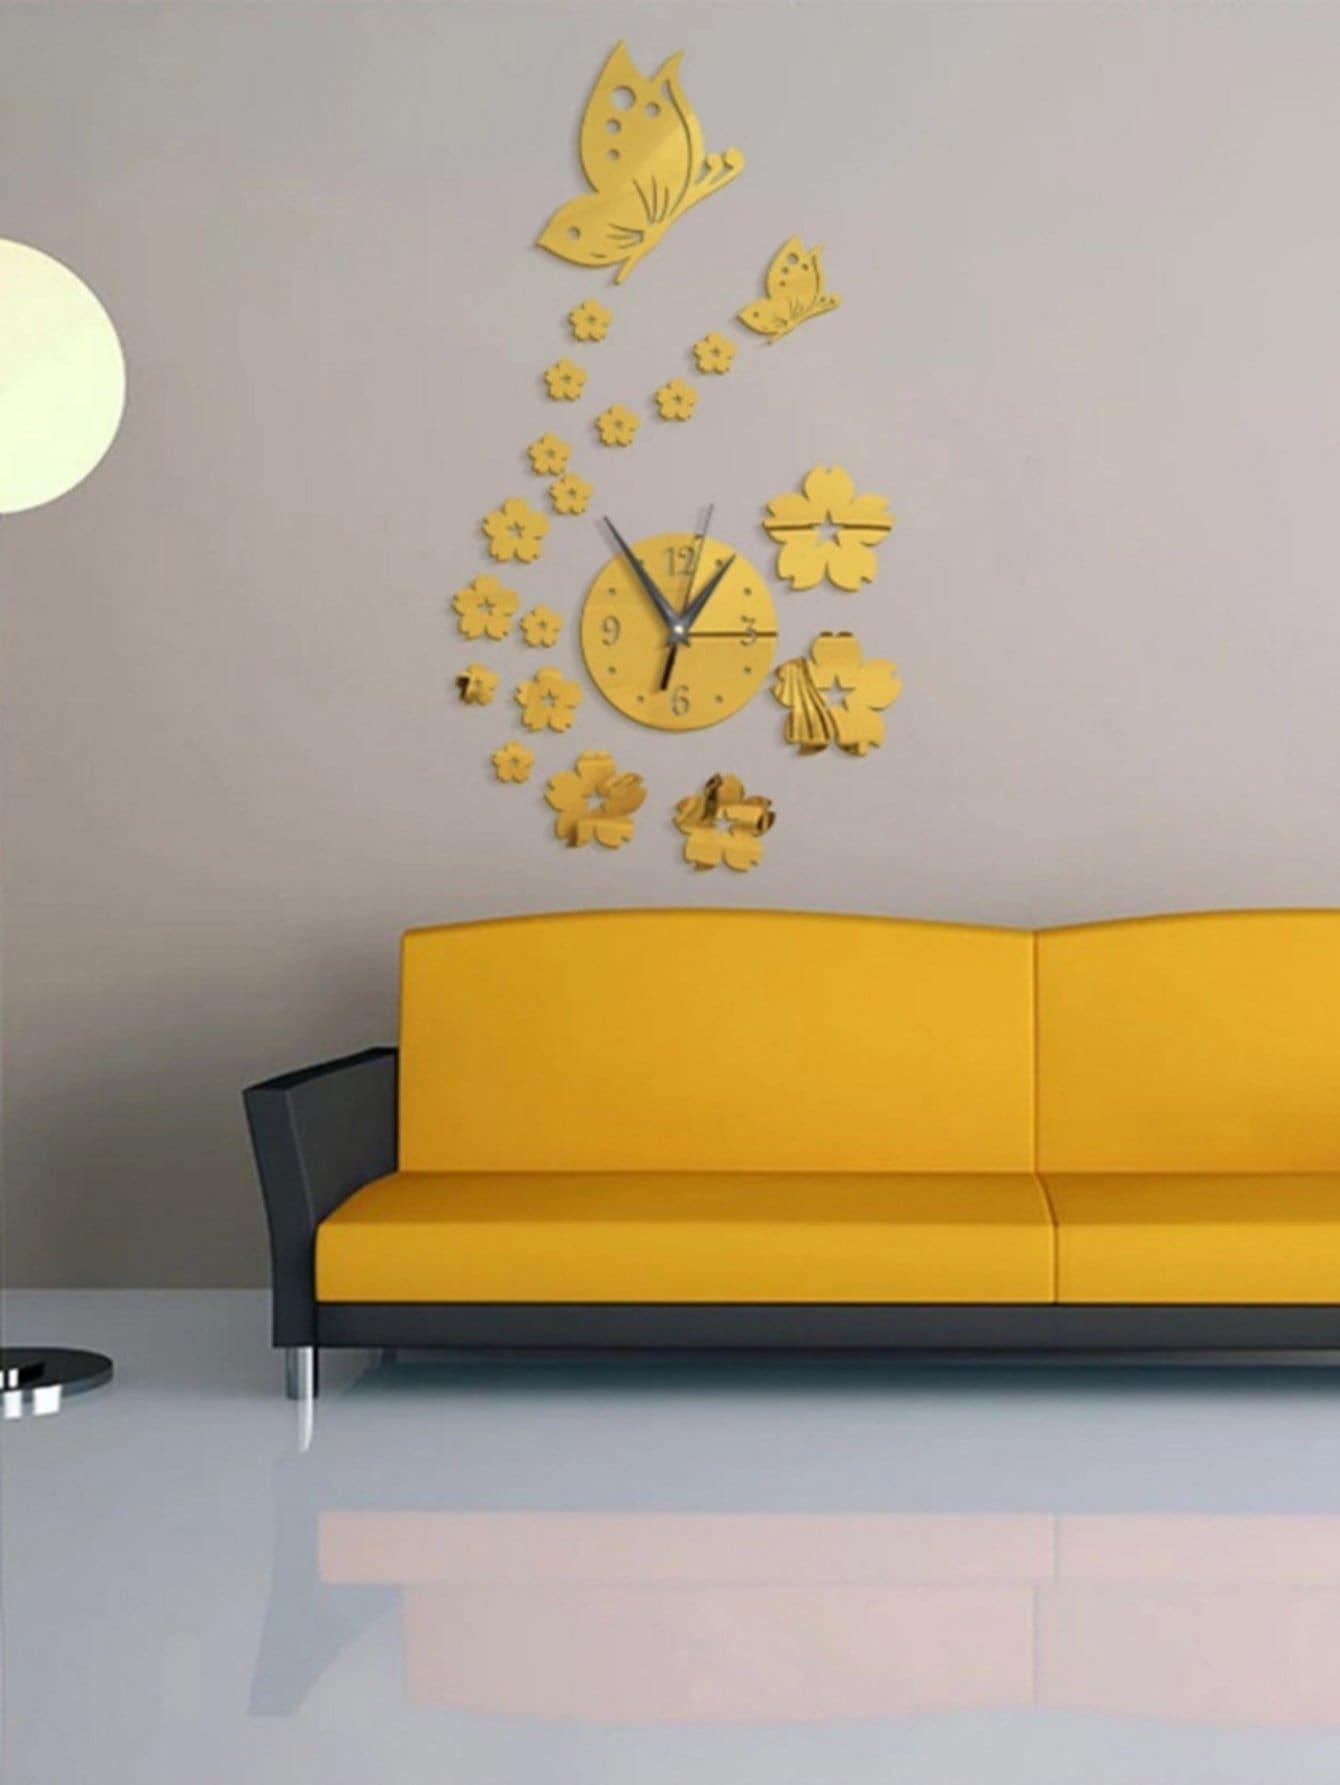 Flower & Clock Mirror Wall Sticker 20pcs -SheIn(Sheinside)